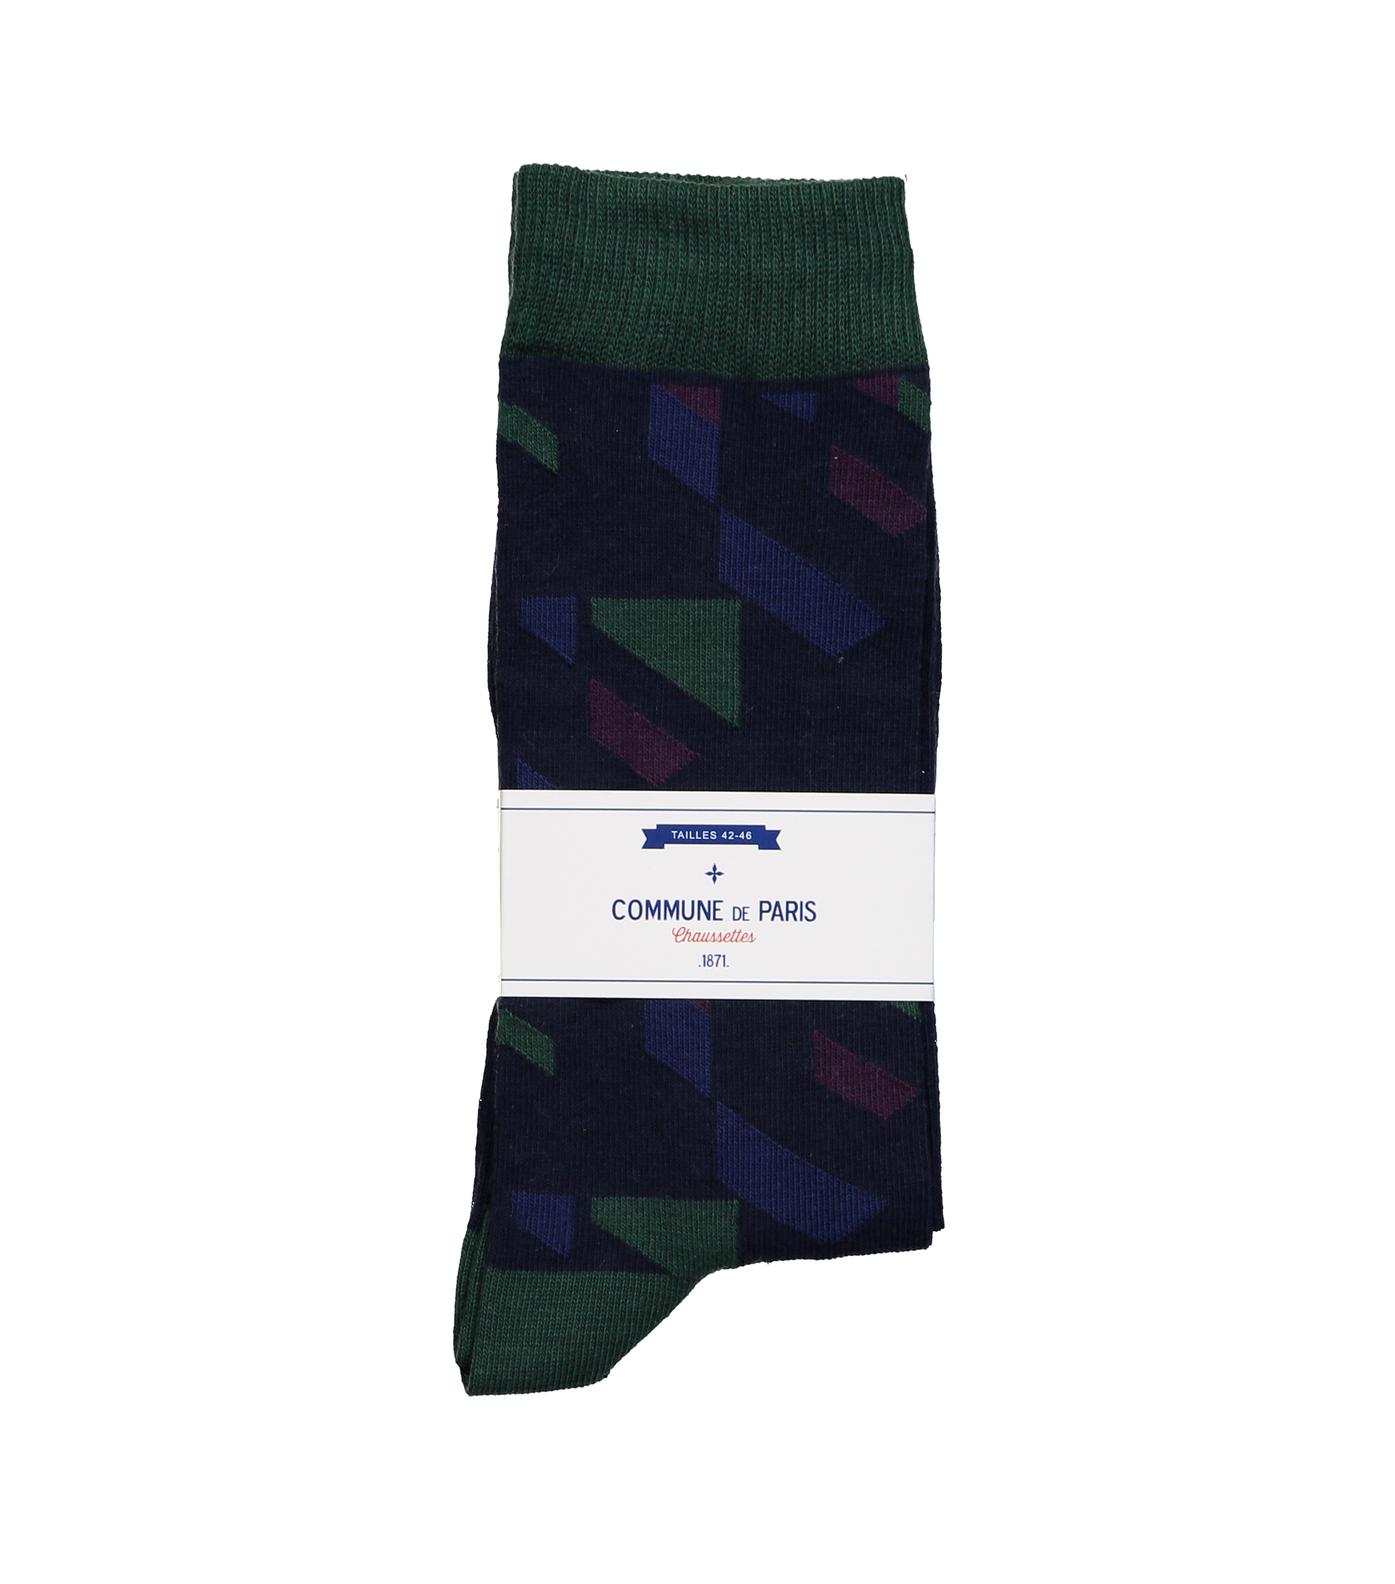 SOCKS BEAUREPAIRE - Navy/green